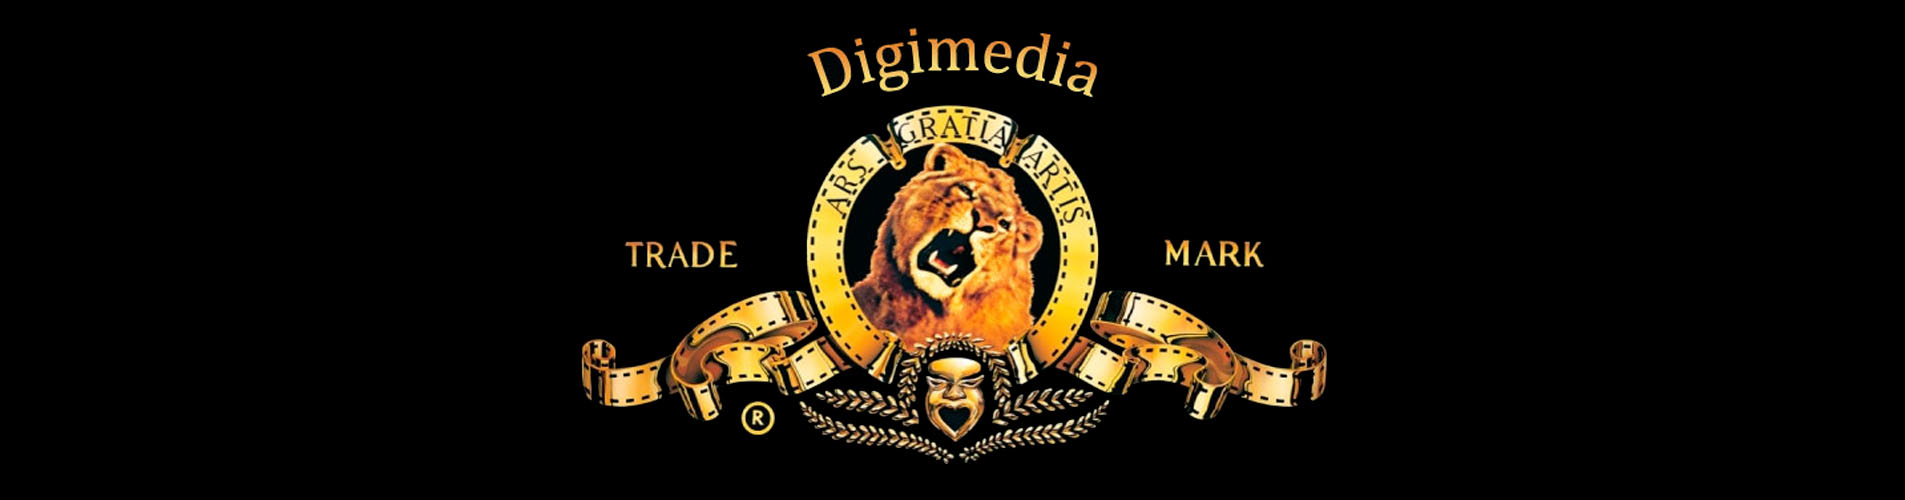 digislide-02